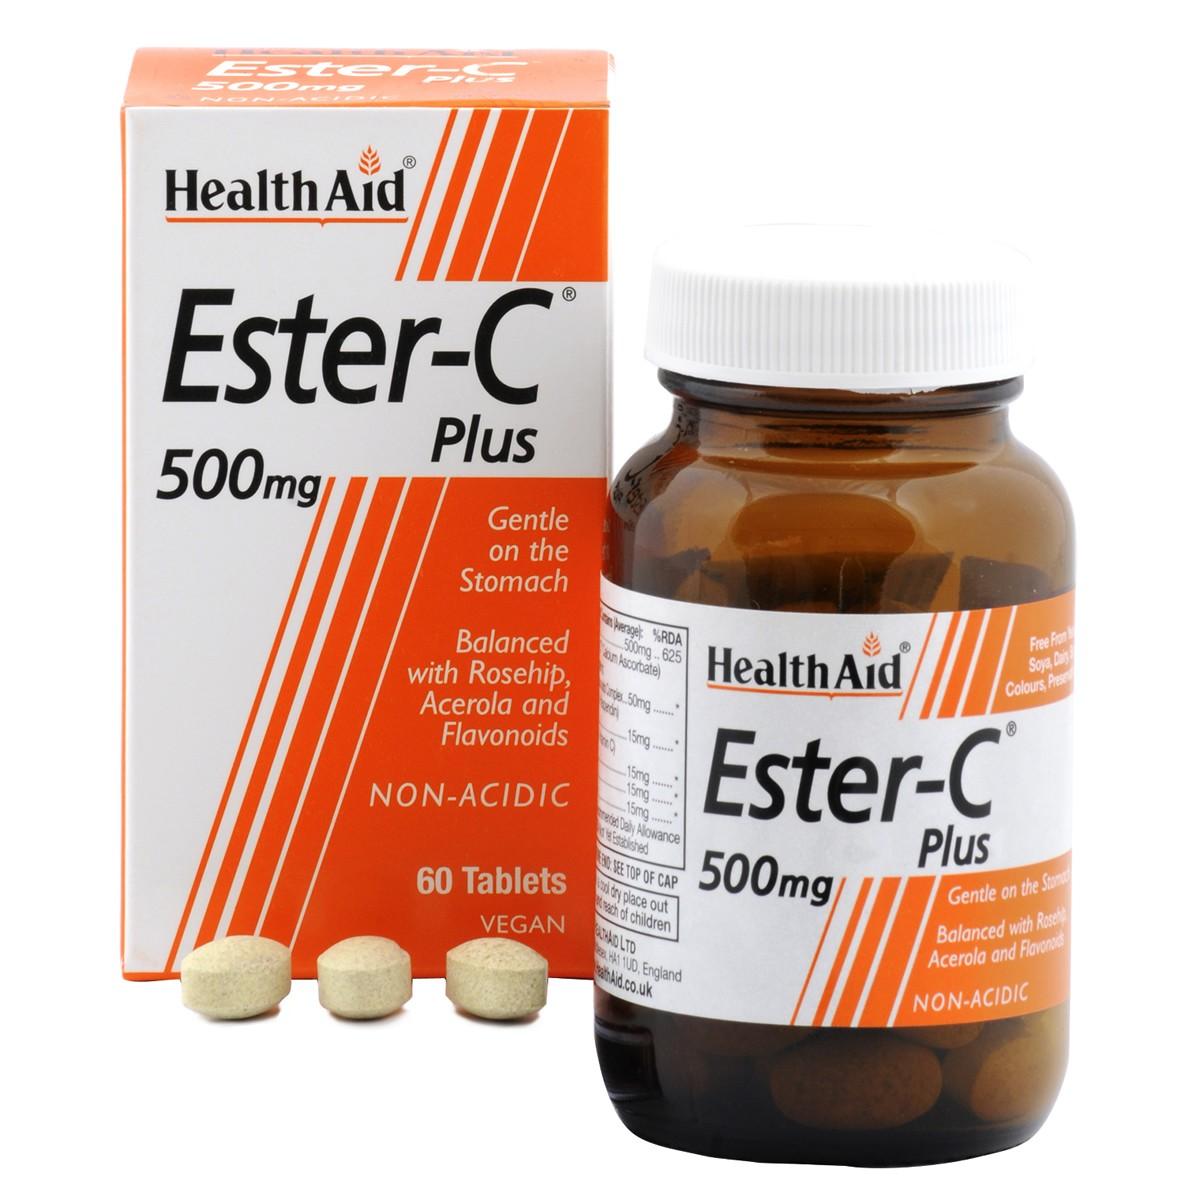 HealthAid Ester-C Plus 500mg